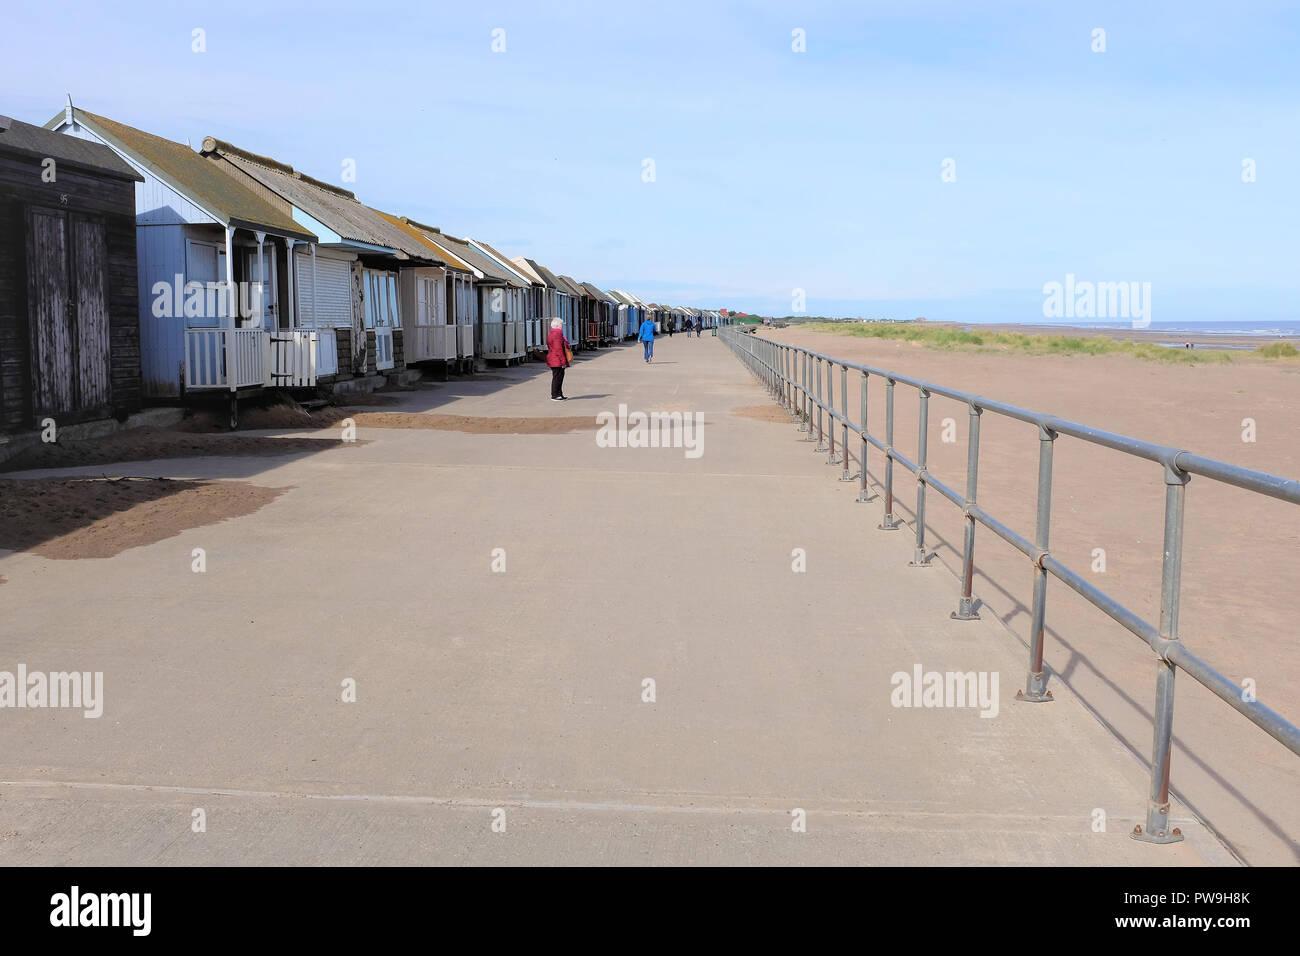 Sandilands, Lincolnshire, UK. October 07, 2018.  Holidaymakers enjoying a long line of various sized beach huts on the promenade at Sandilands near Su - Stock Image